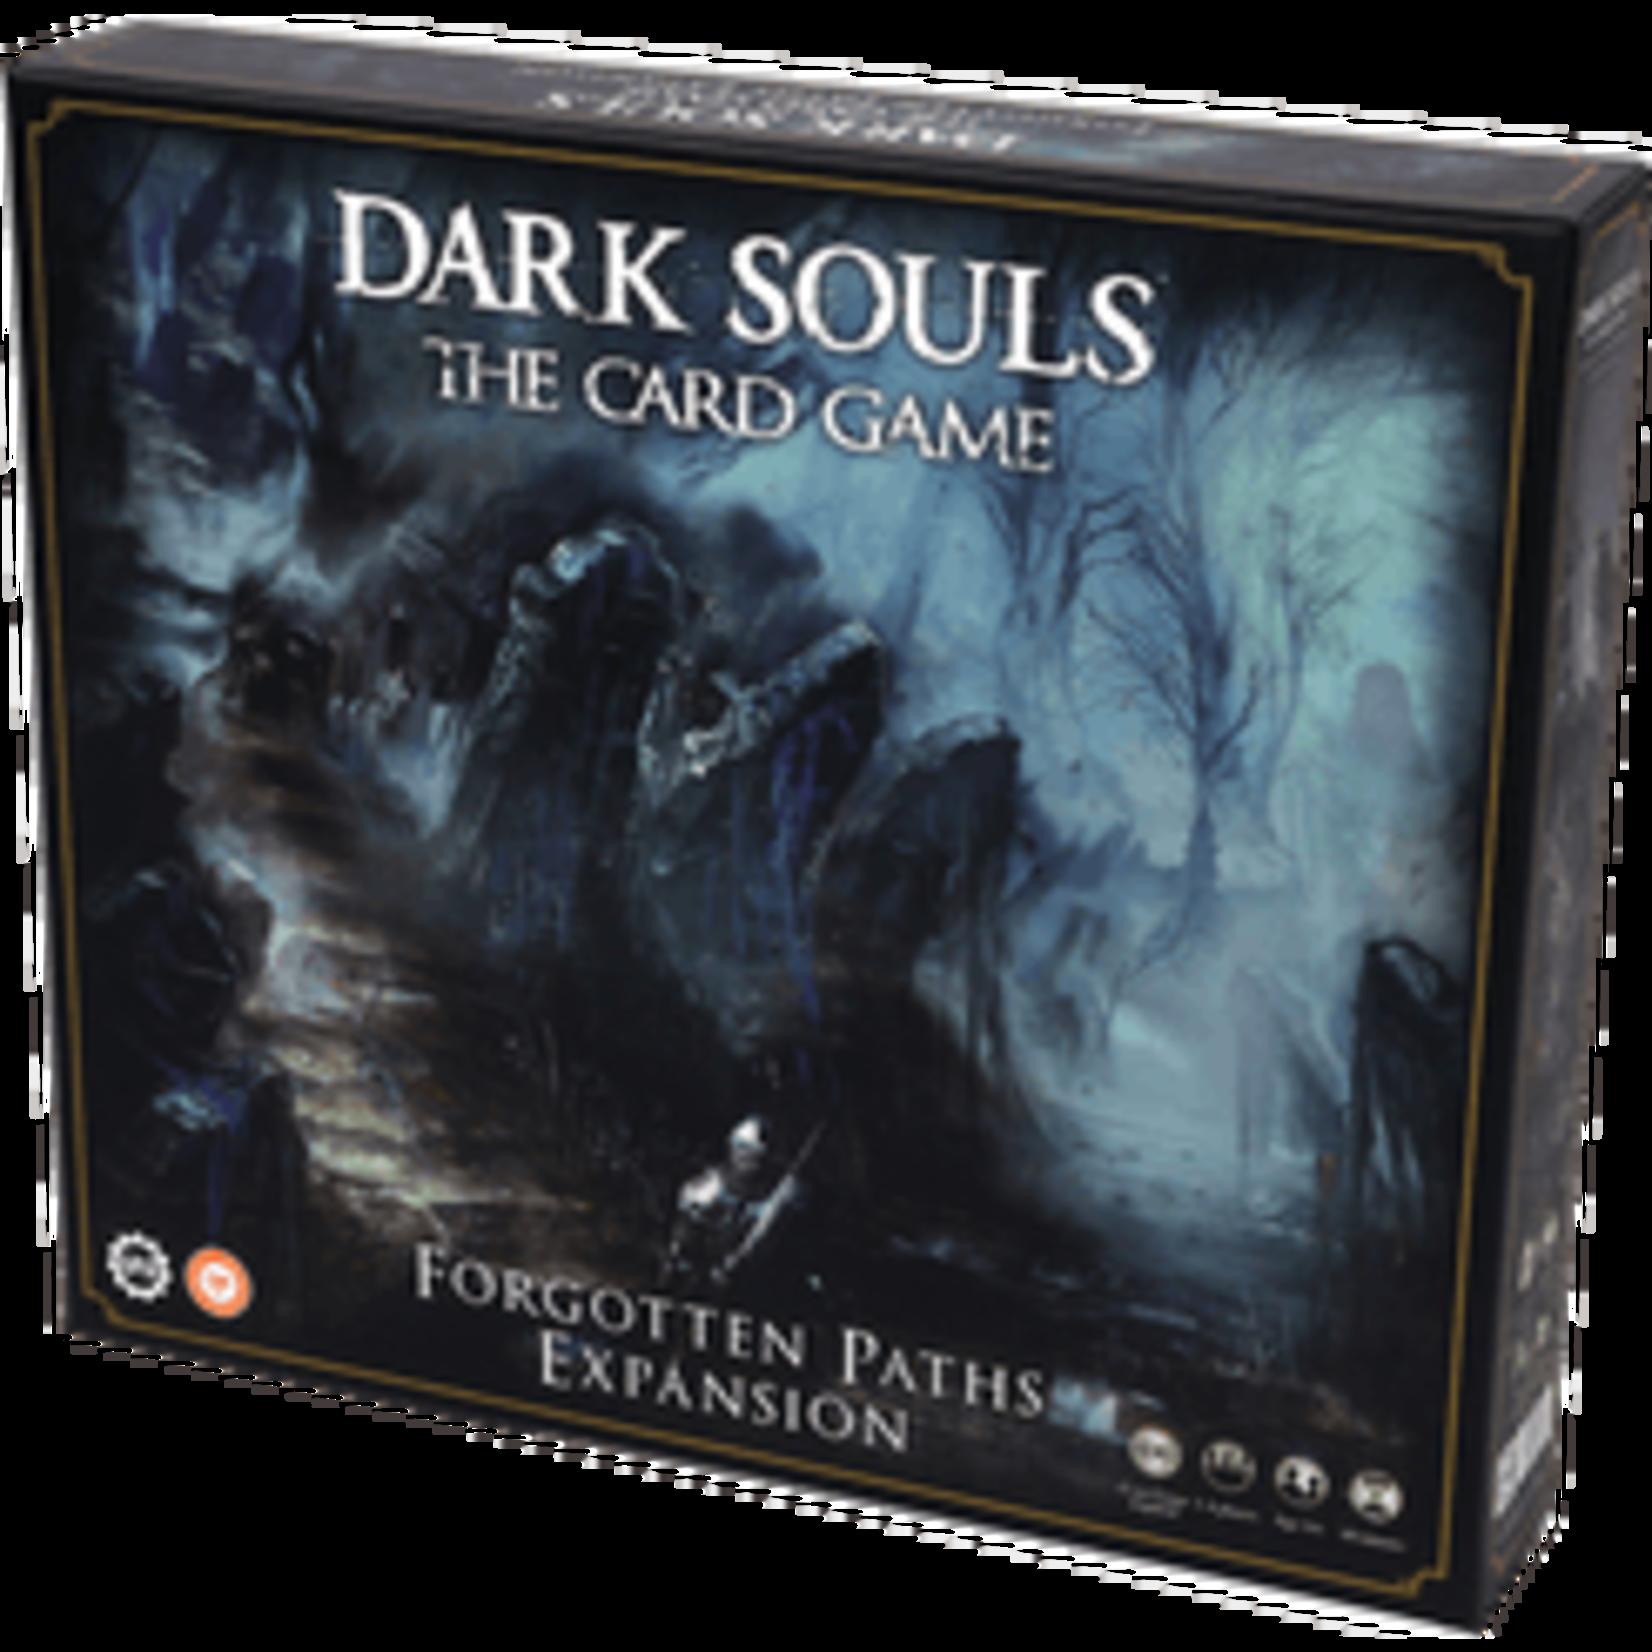 Dark Souls Card Game: Forgotten Paths Expansion